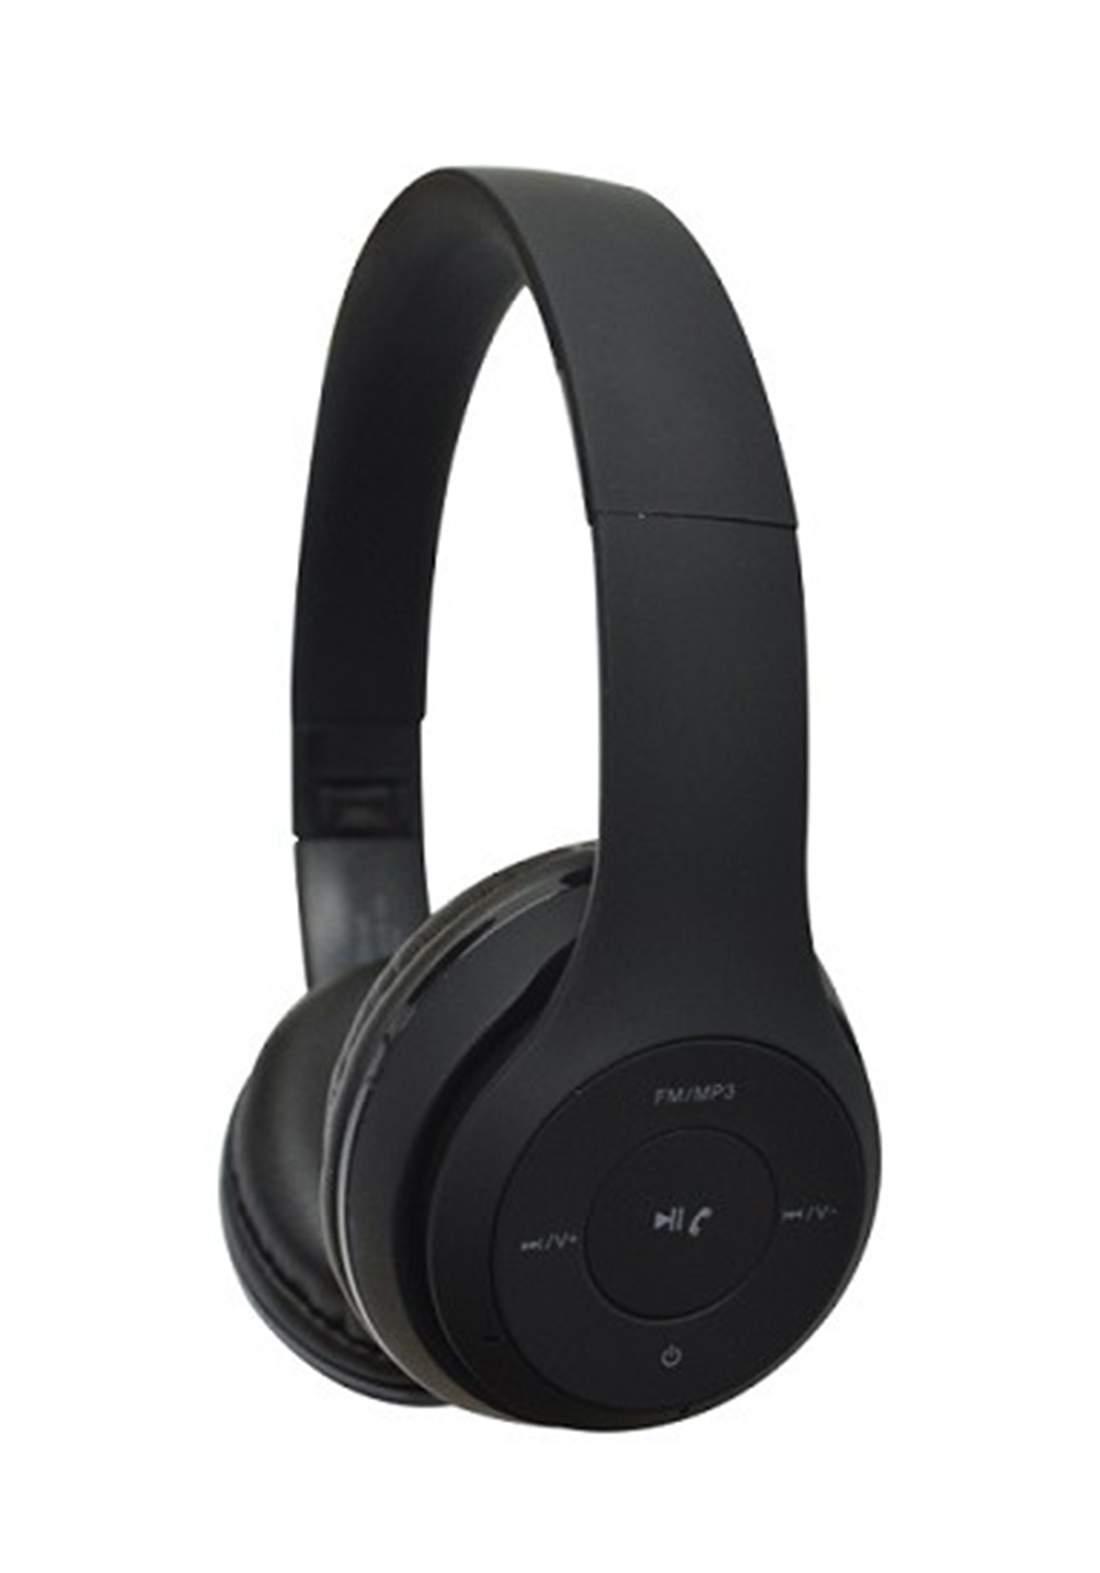 Havit HV-H2575BT Bluetooth Headphone - Black سماعة